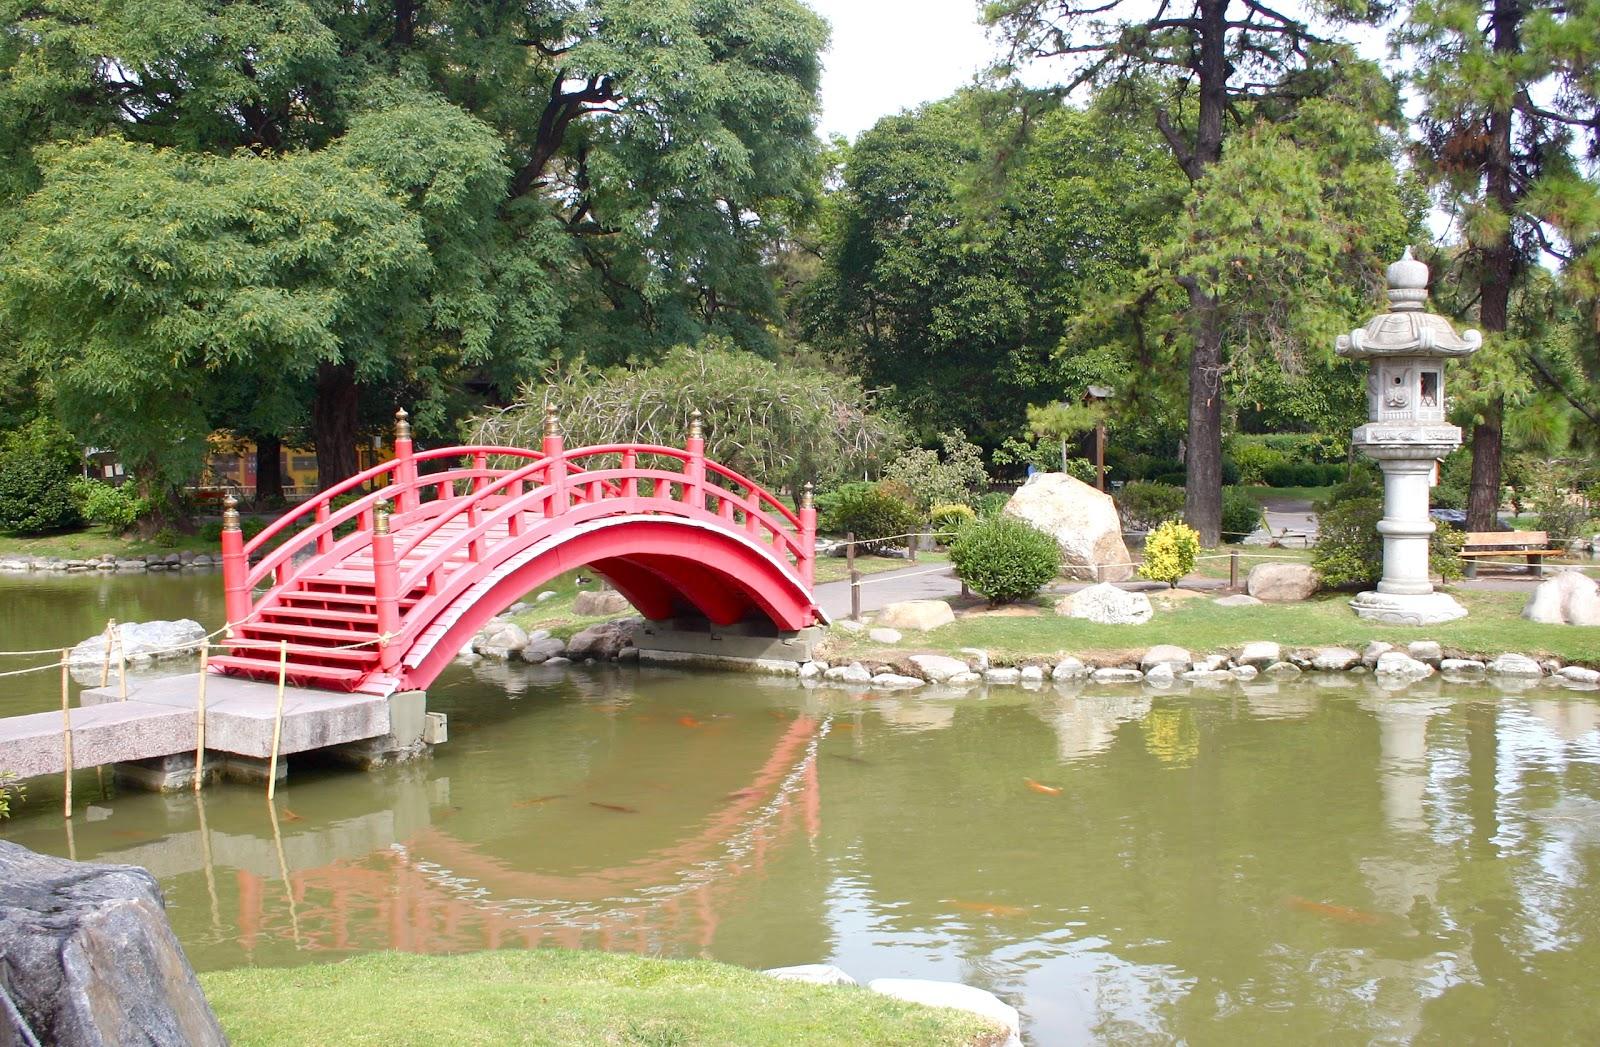 Kokoro la magia del giardino l 39 entrata - Giardini giapponesi ...